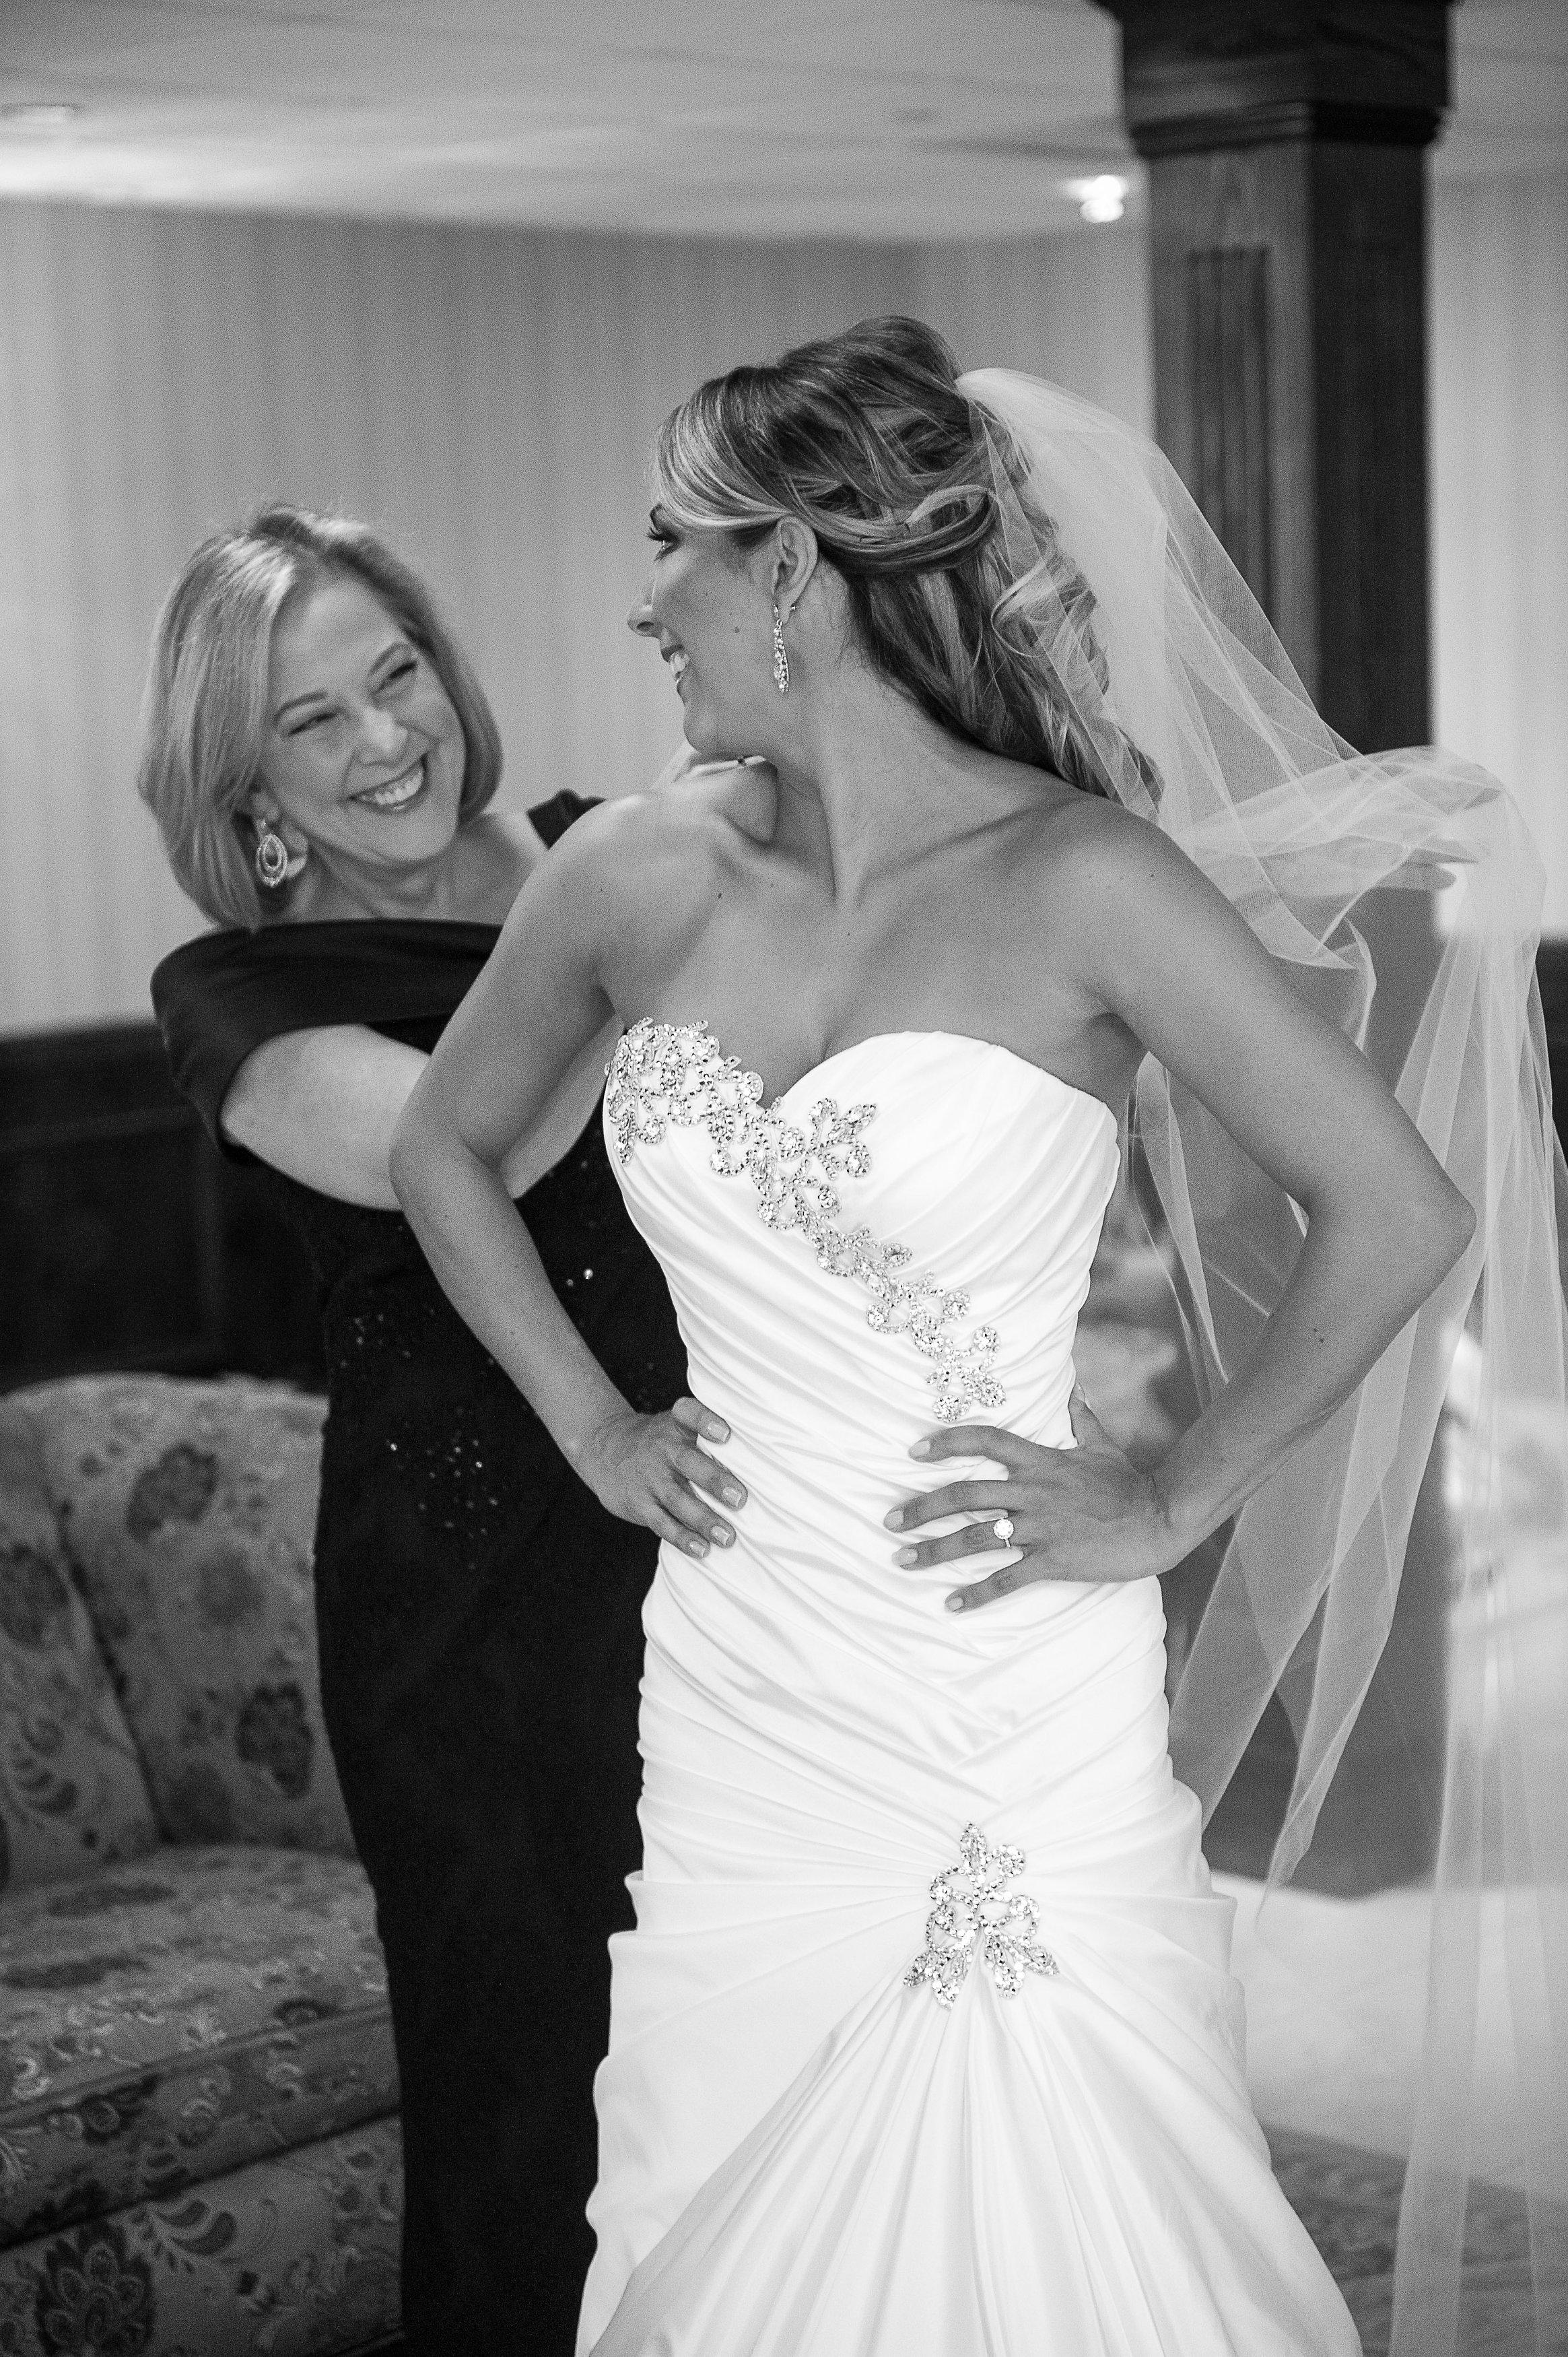 Ceci_New_York_Custom_Invitation_ New_Jersey_Wedding_Luxury_Personalized_Ceci_Style_Bride_Foil_Stamping84.JPG